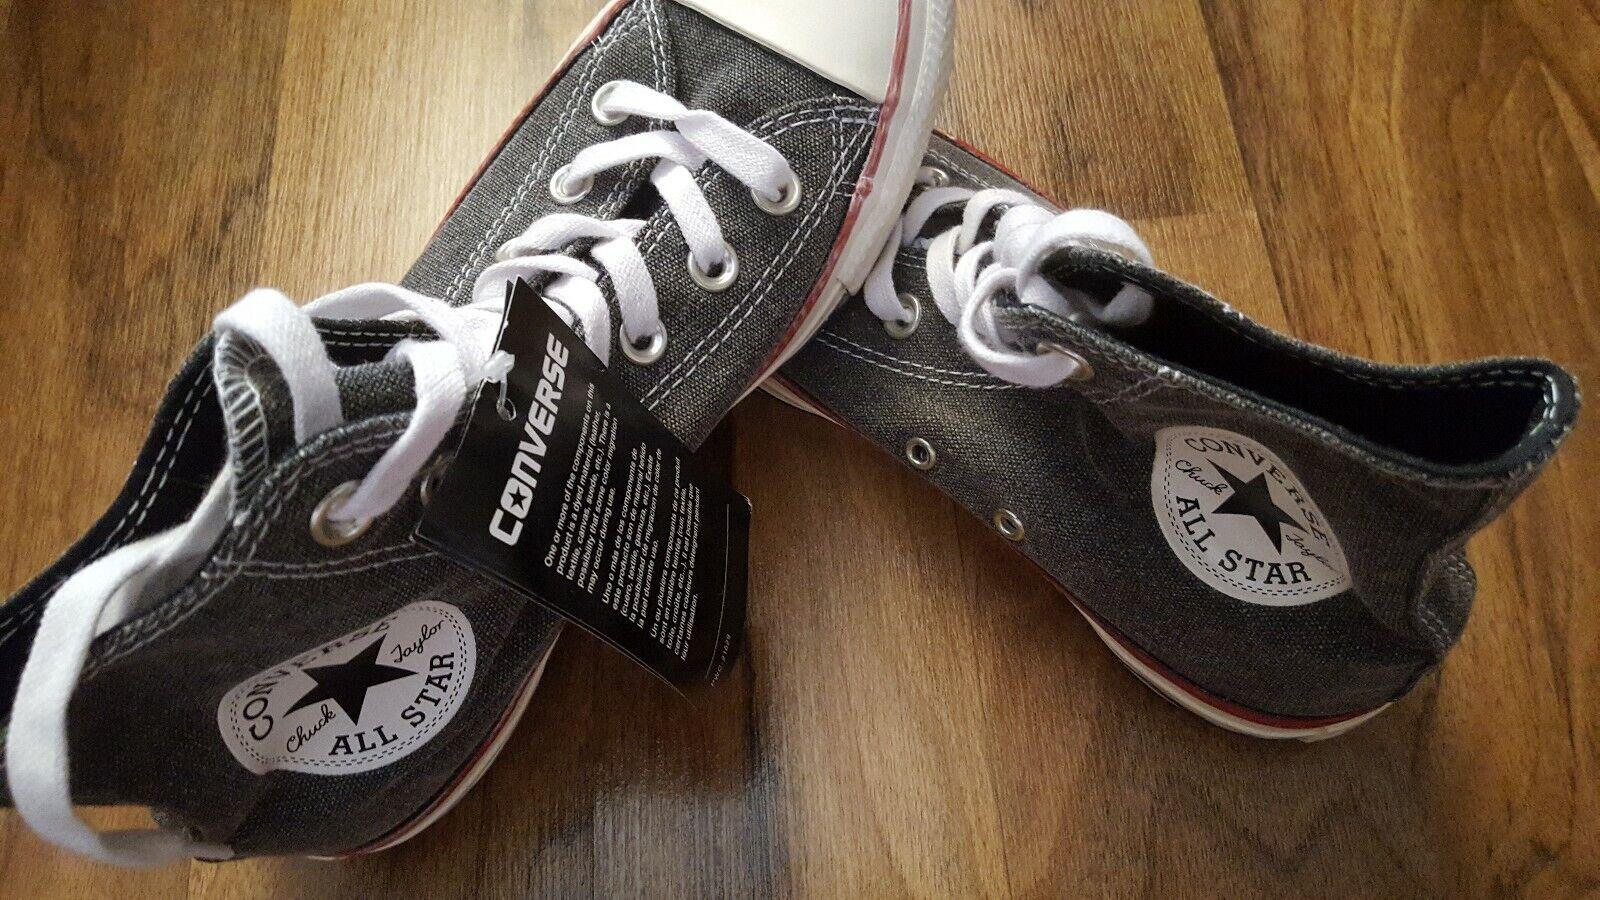 BNWTB trendy Converse AllStar Unisex size UK4.5 Chuck Taylor Pro Hi Black/White